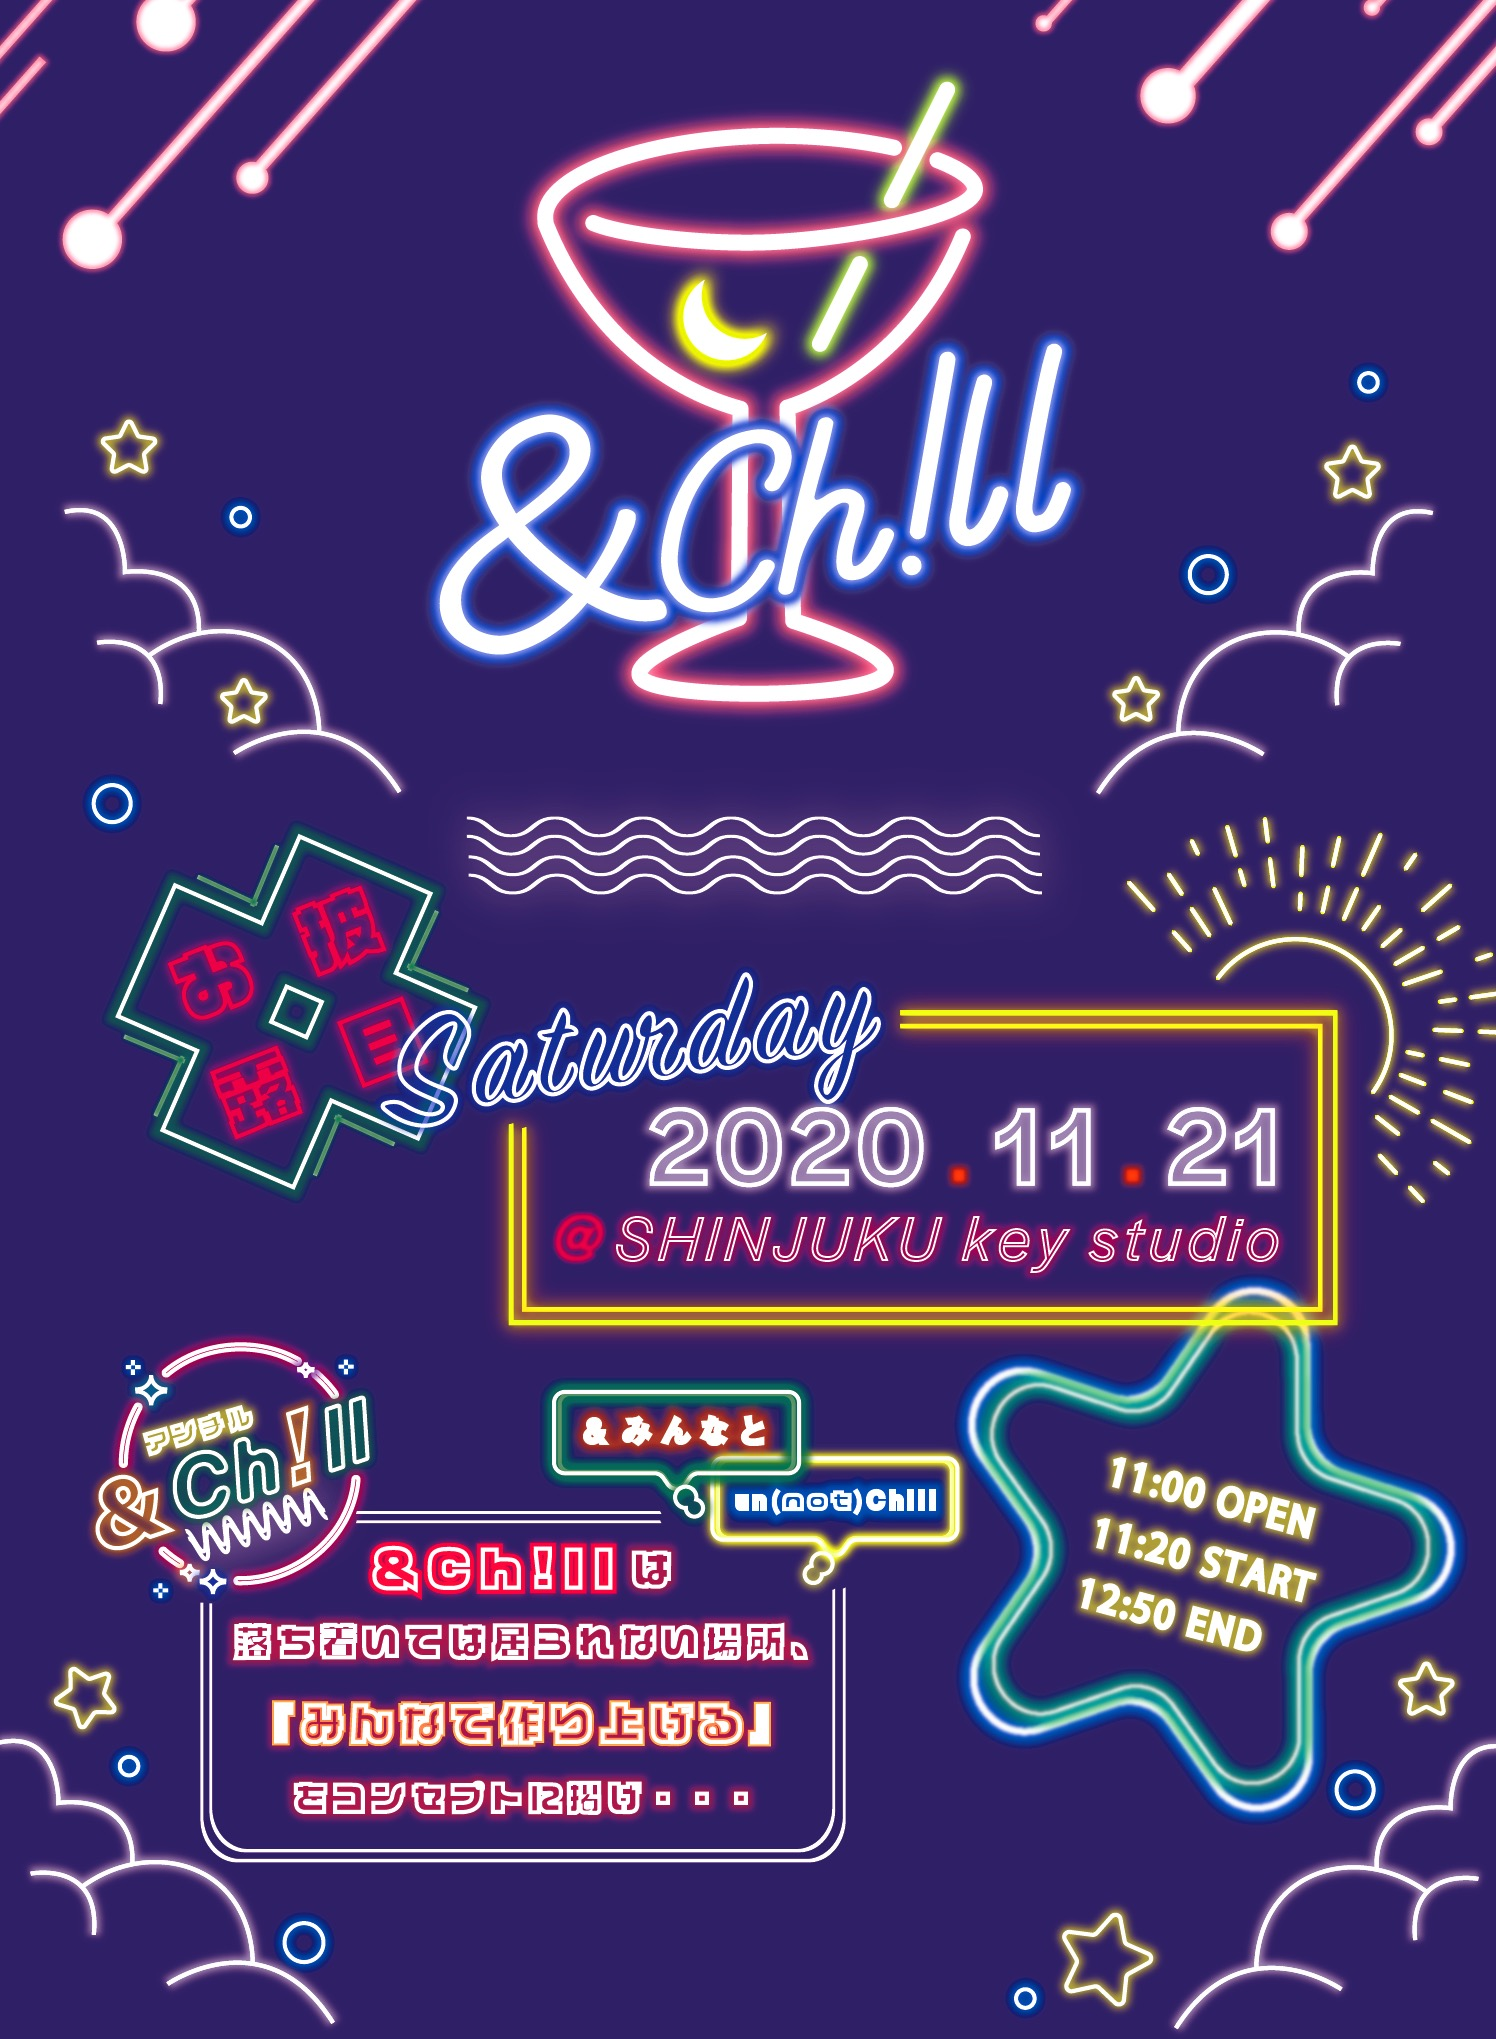 &Ch!ll お披露目 LIVE